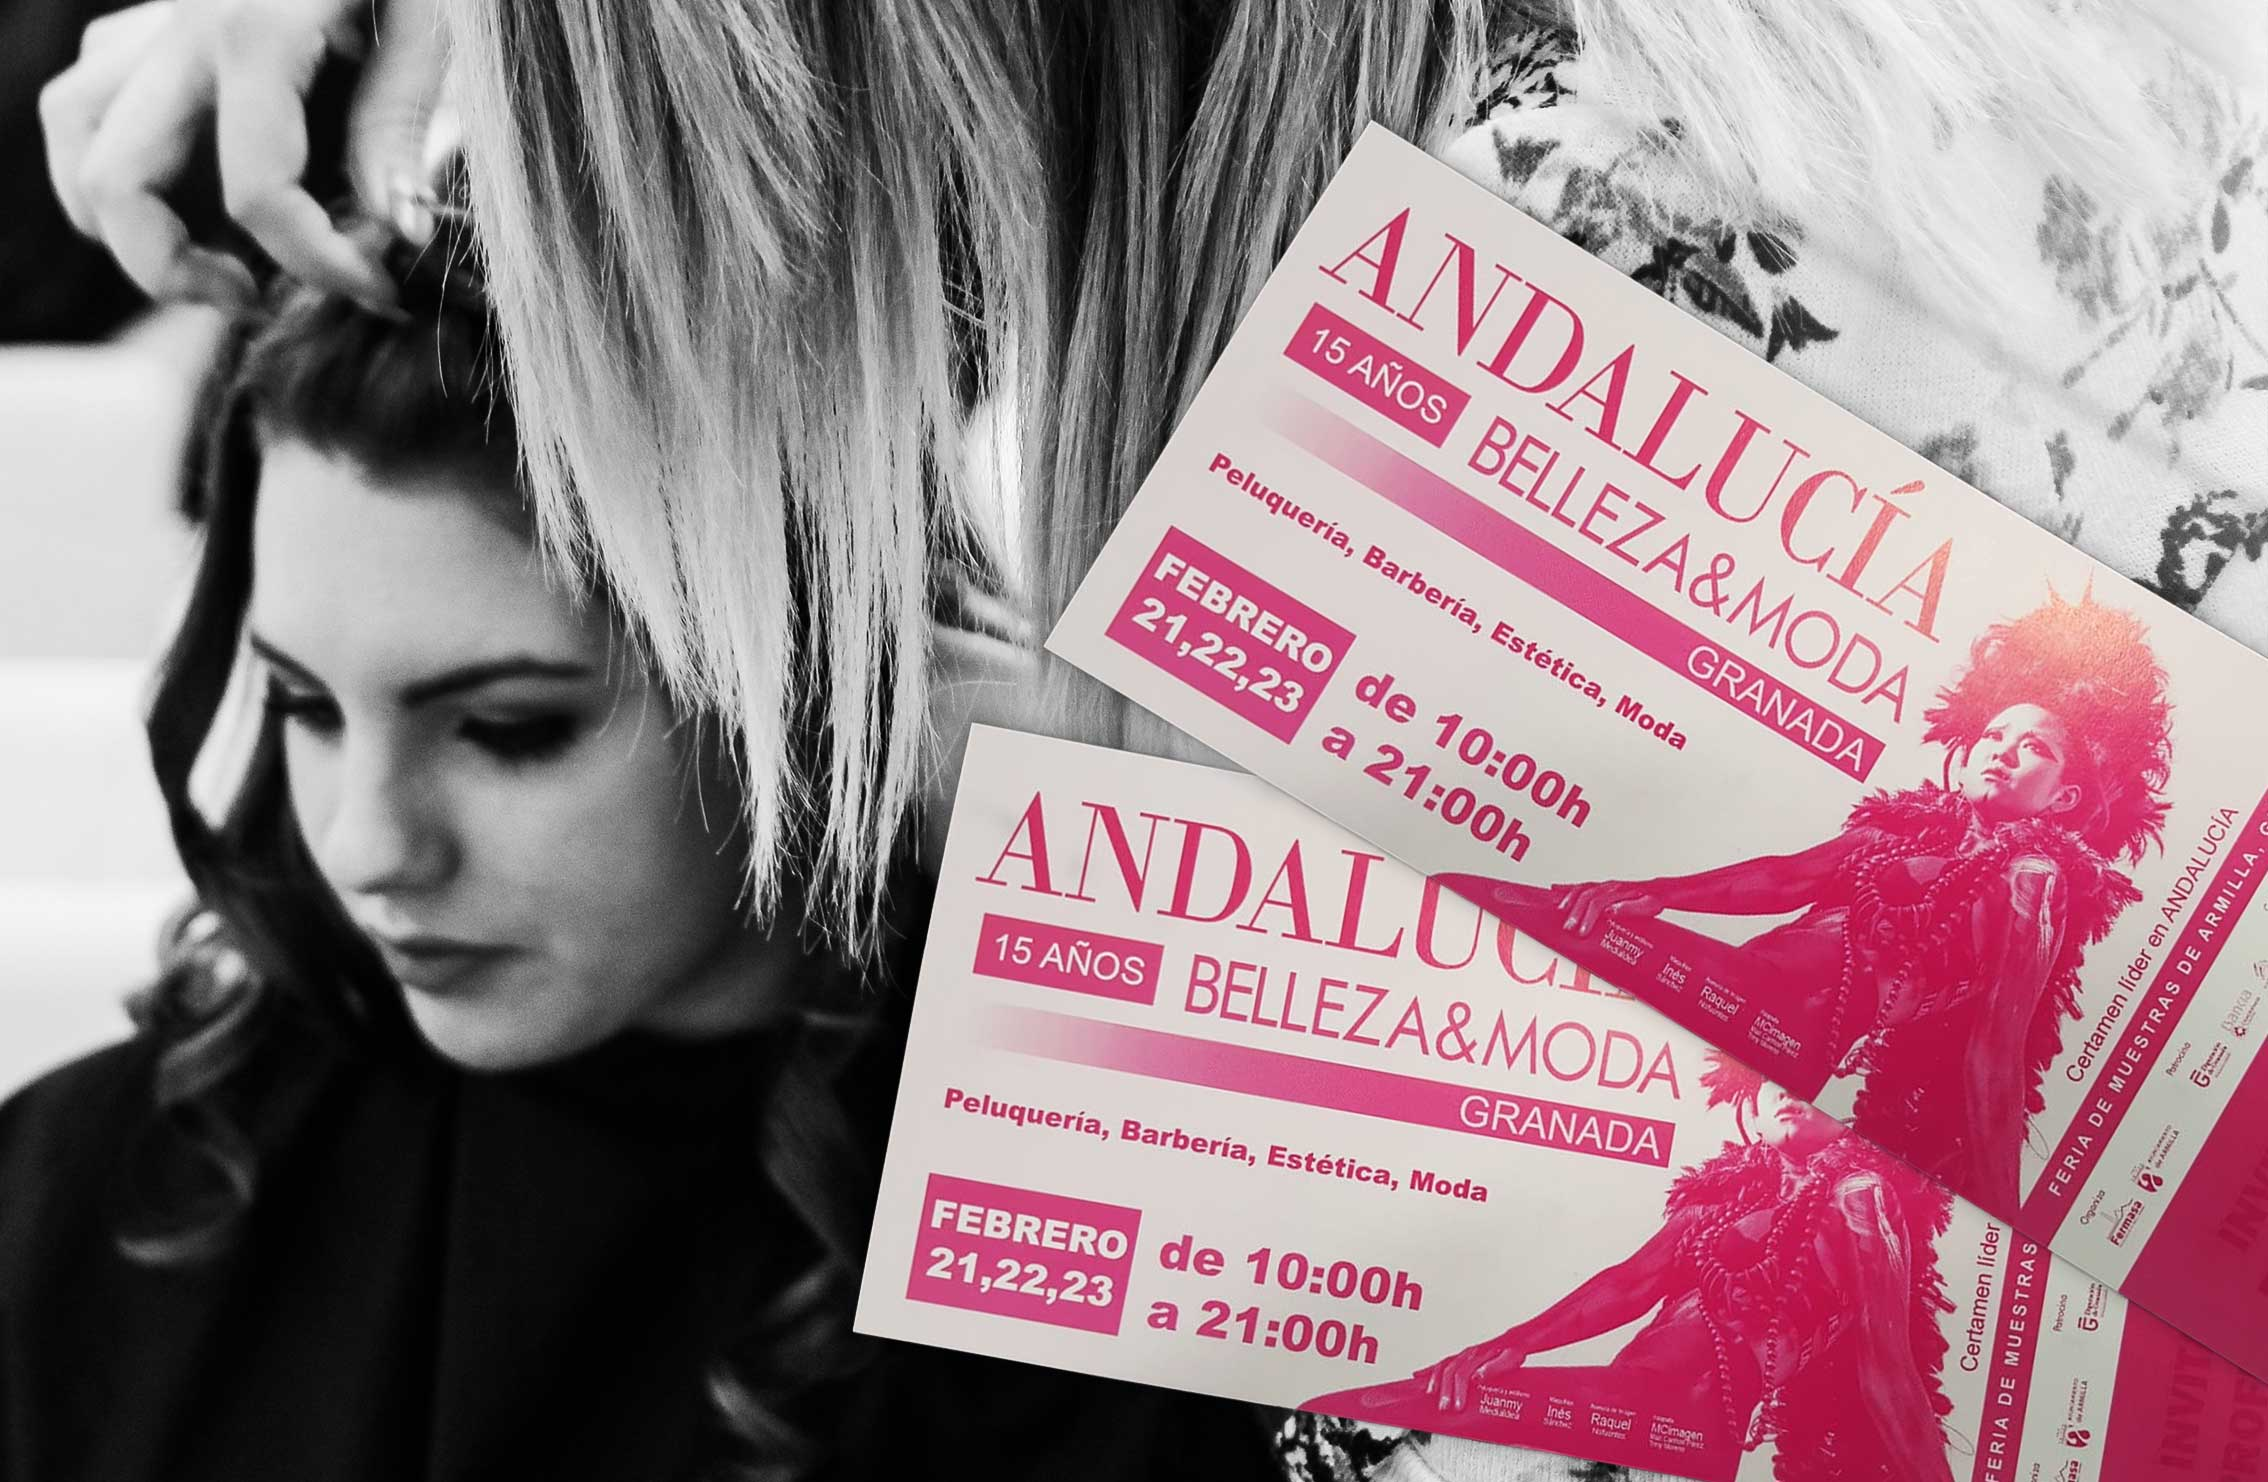 Participación en «Andalucía Belleza y Moda»